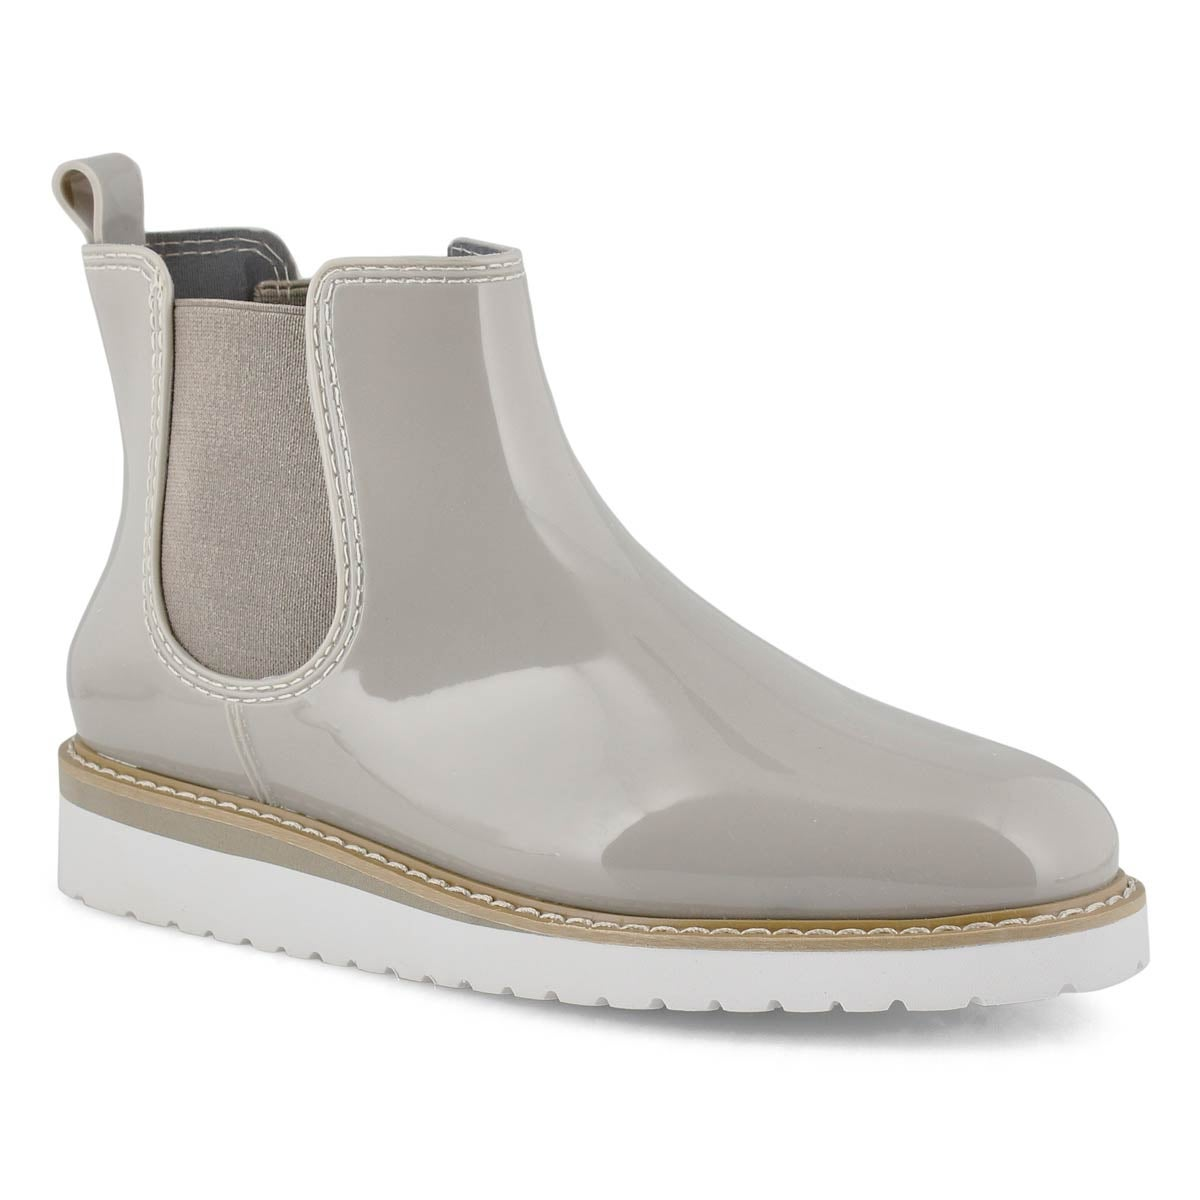 Women's KENSINGTON dove wtpf chelsea boots